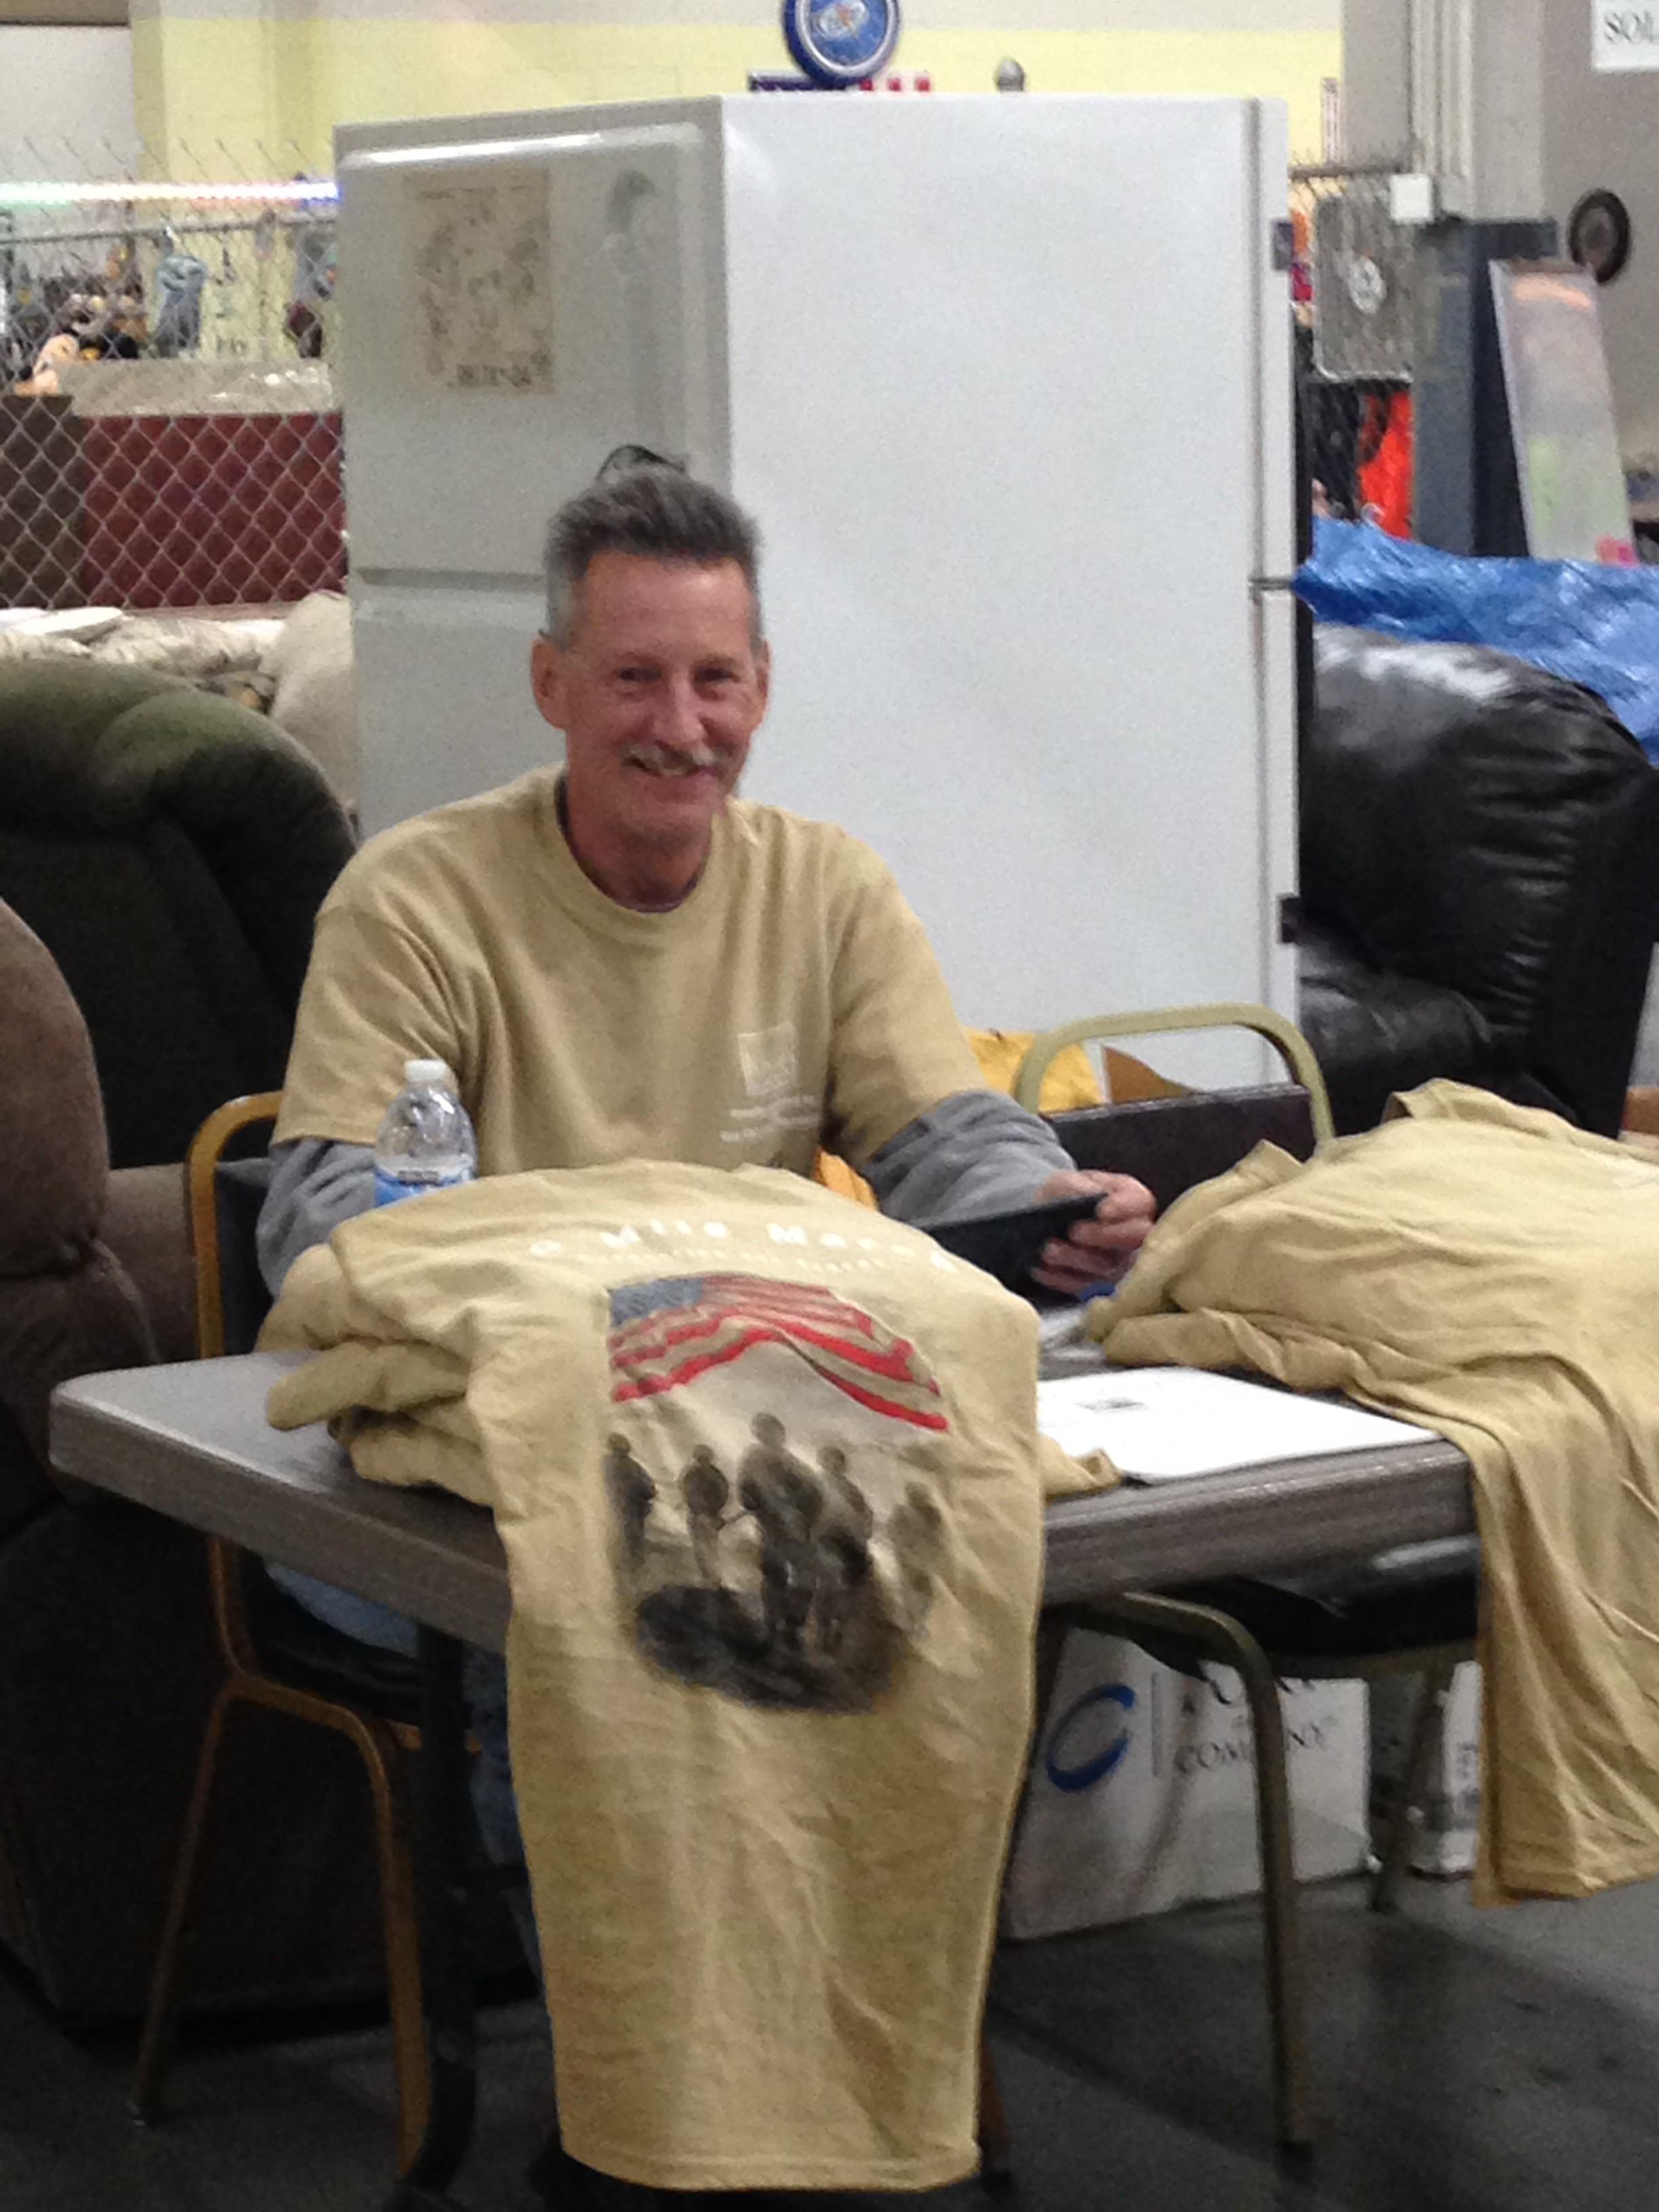 IMG_7476 - selling shirts